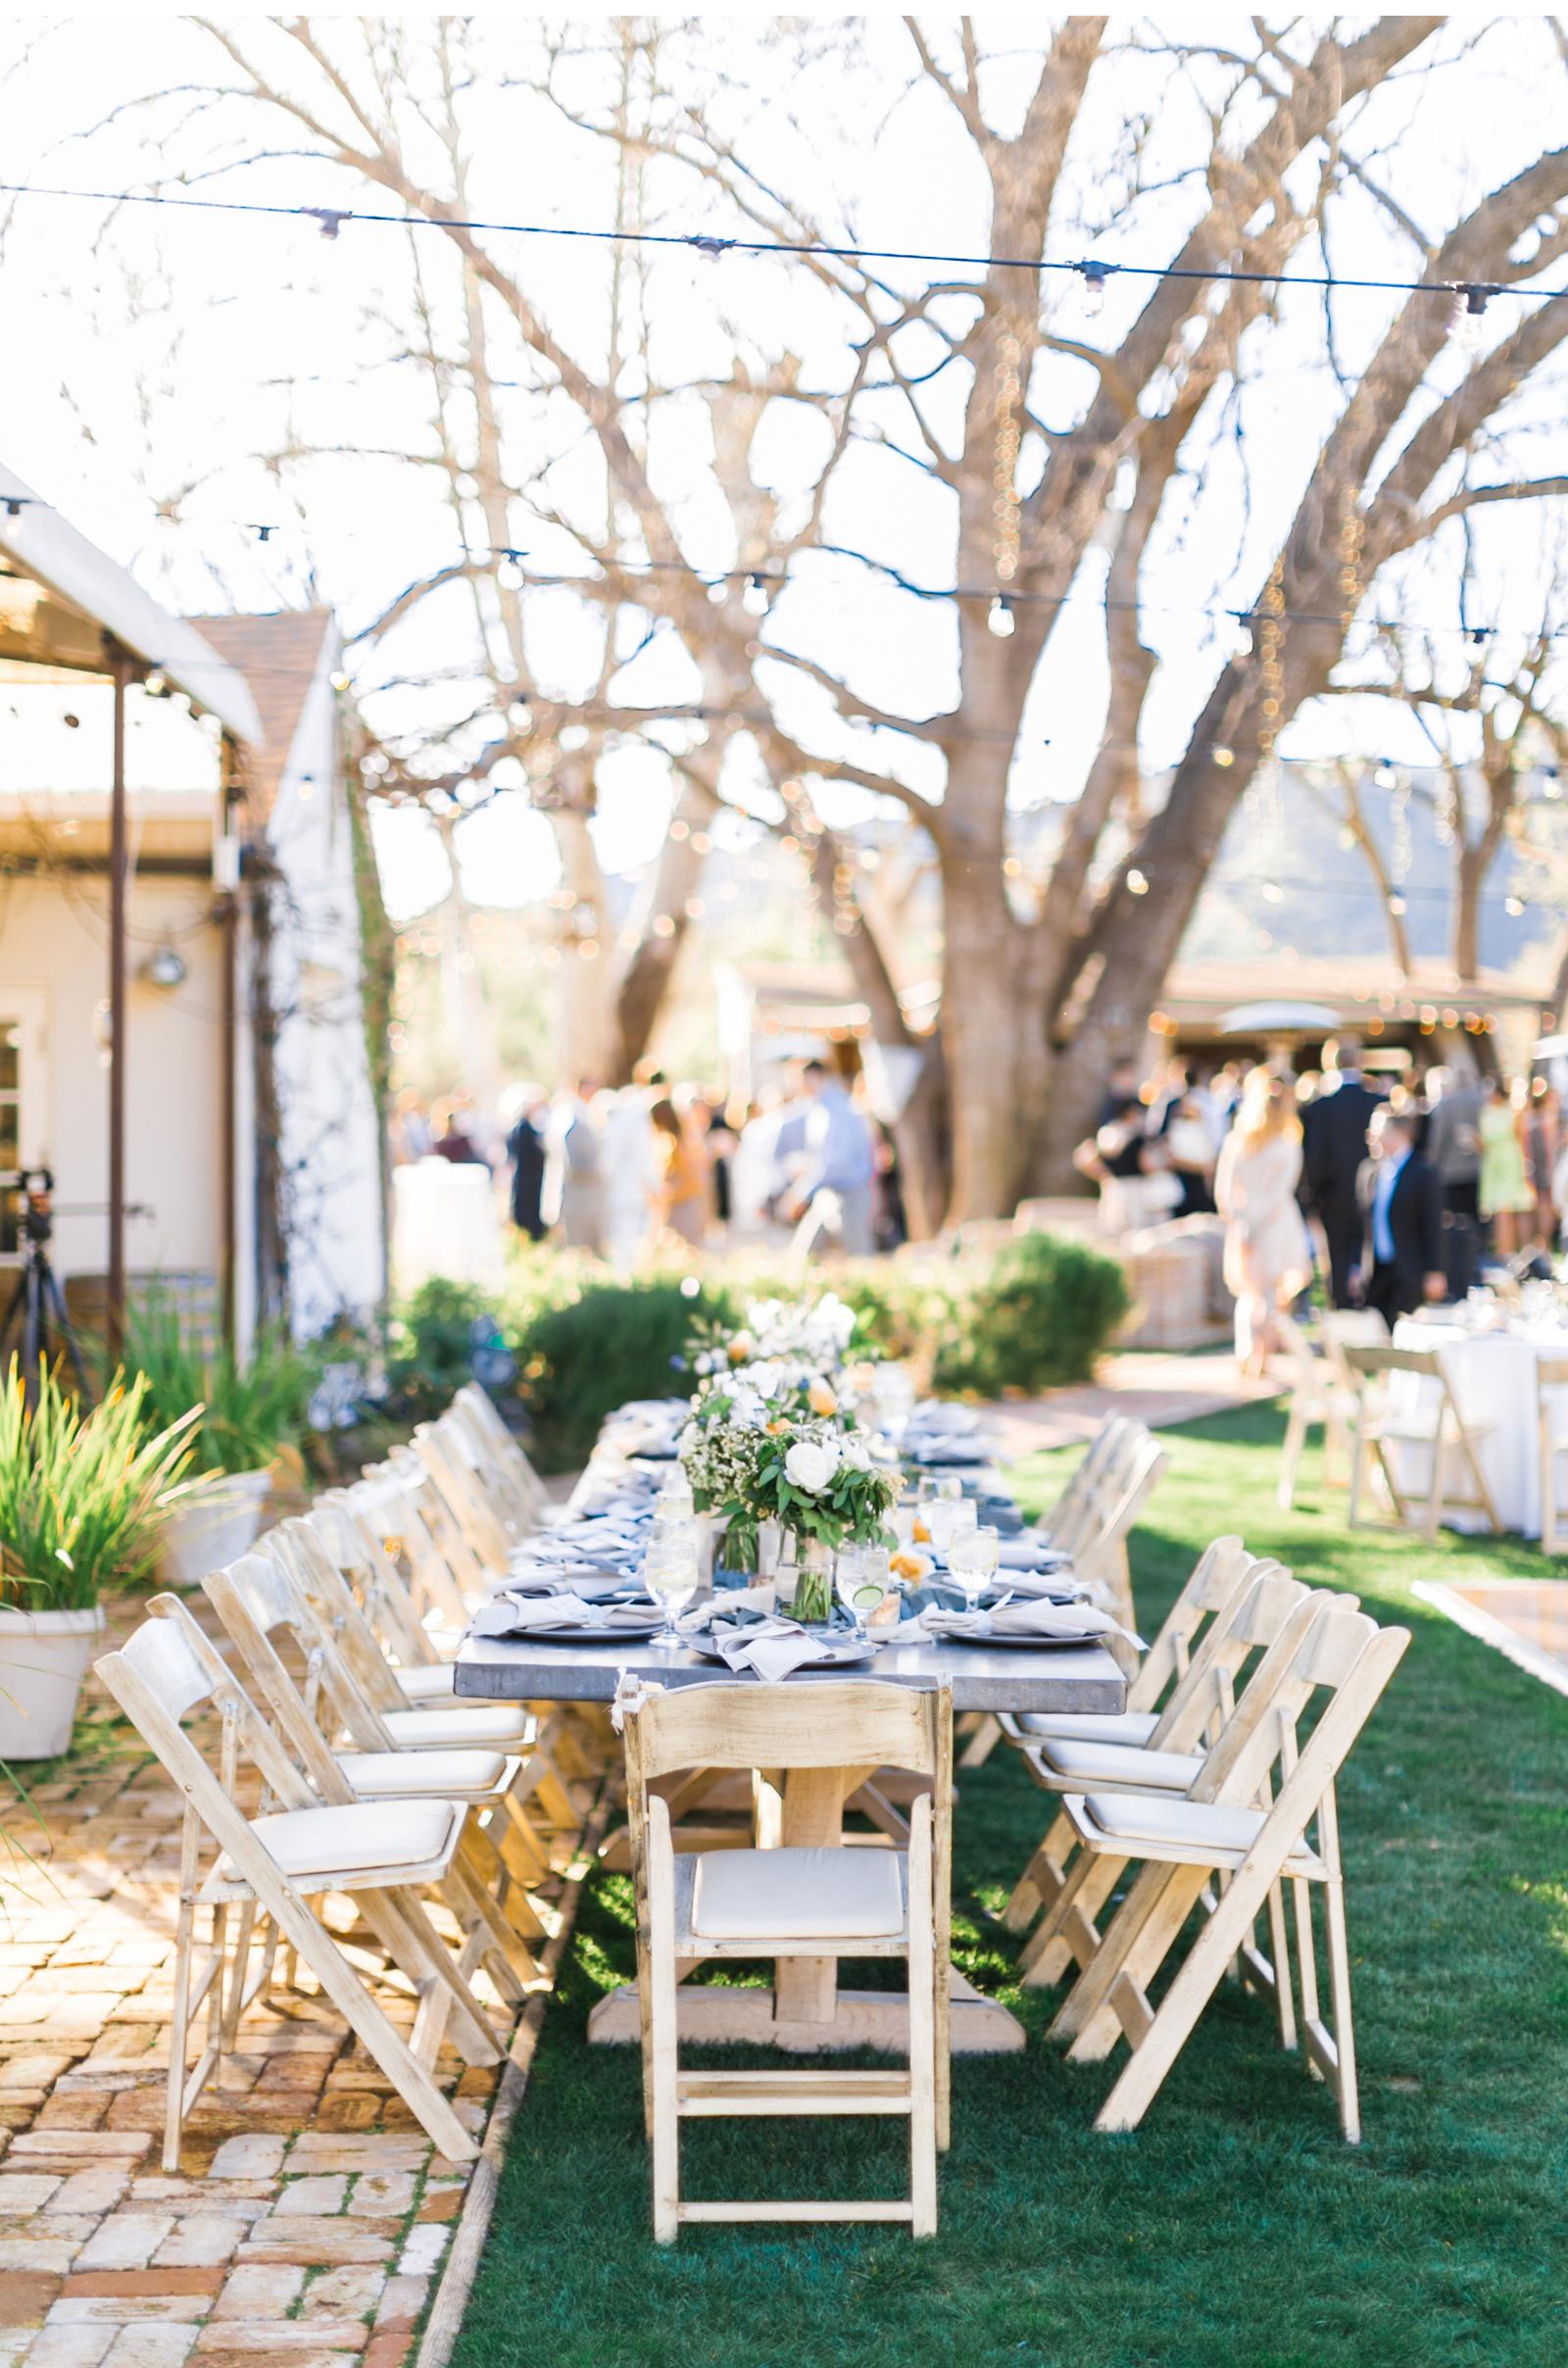 Triunfo-Creek-Malibu-Wedding-Natalie-Schutt-Photography-Couture-Events-Style-Me-Pretty_13.jpg